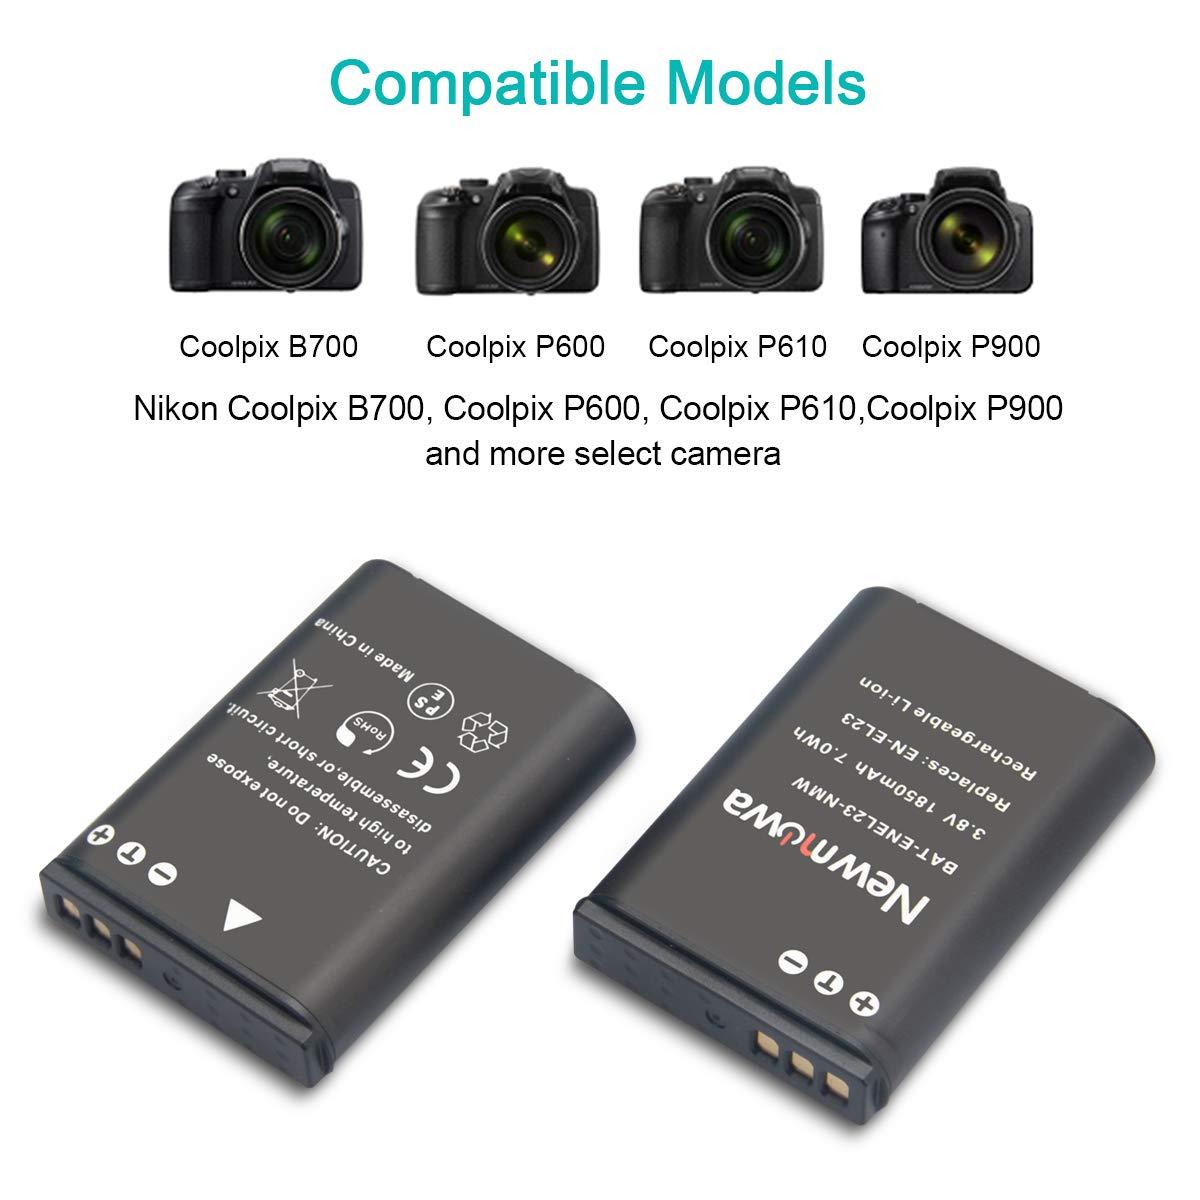 Newmowa EN-EL23 Battery (2 Pack) and Dual USB Charger Kit for Nikon EN-EL23 and Nikon Coolpix B700, P600, P610, P610s, P900, P900s, S810c Digital ...